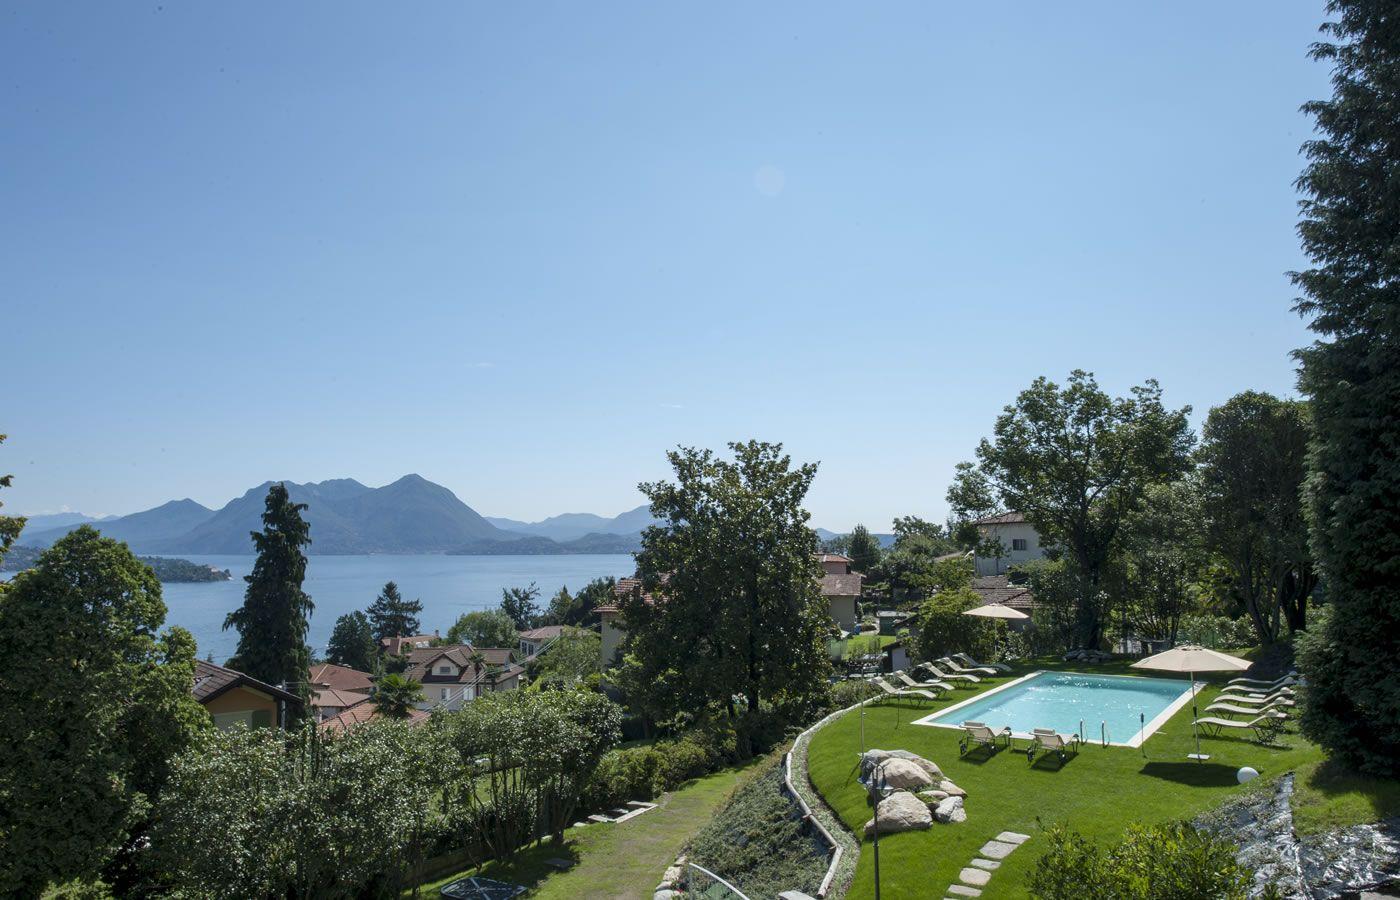 Lake and swimmingpool view